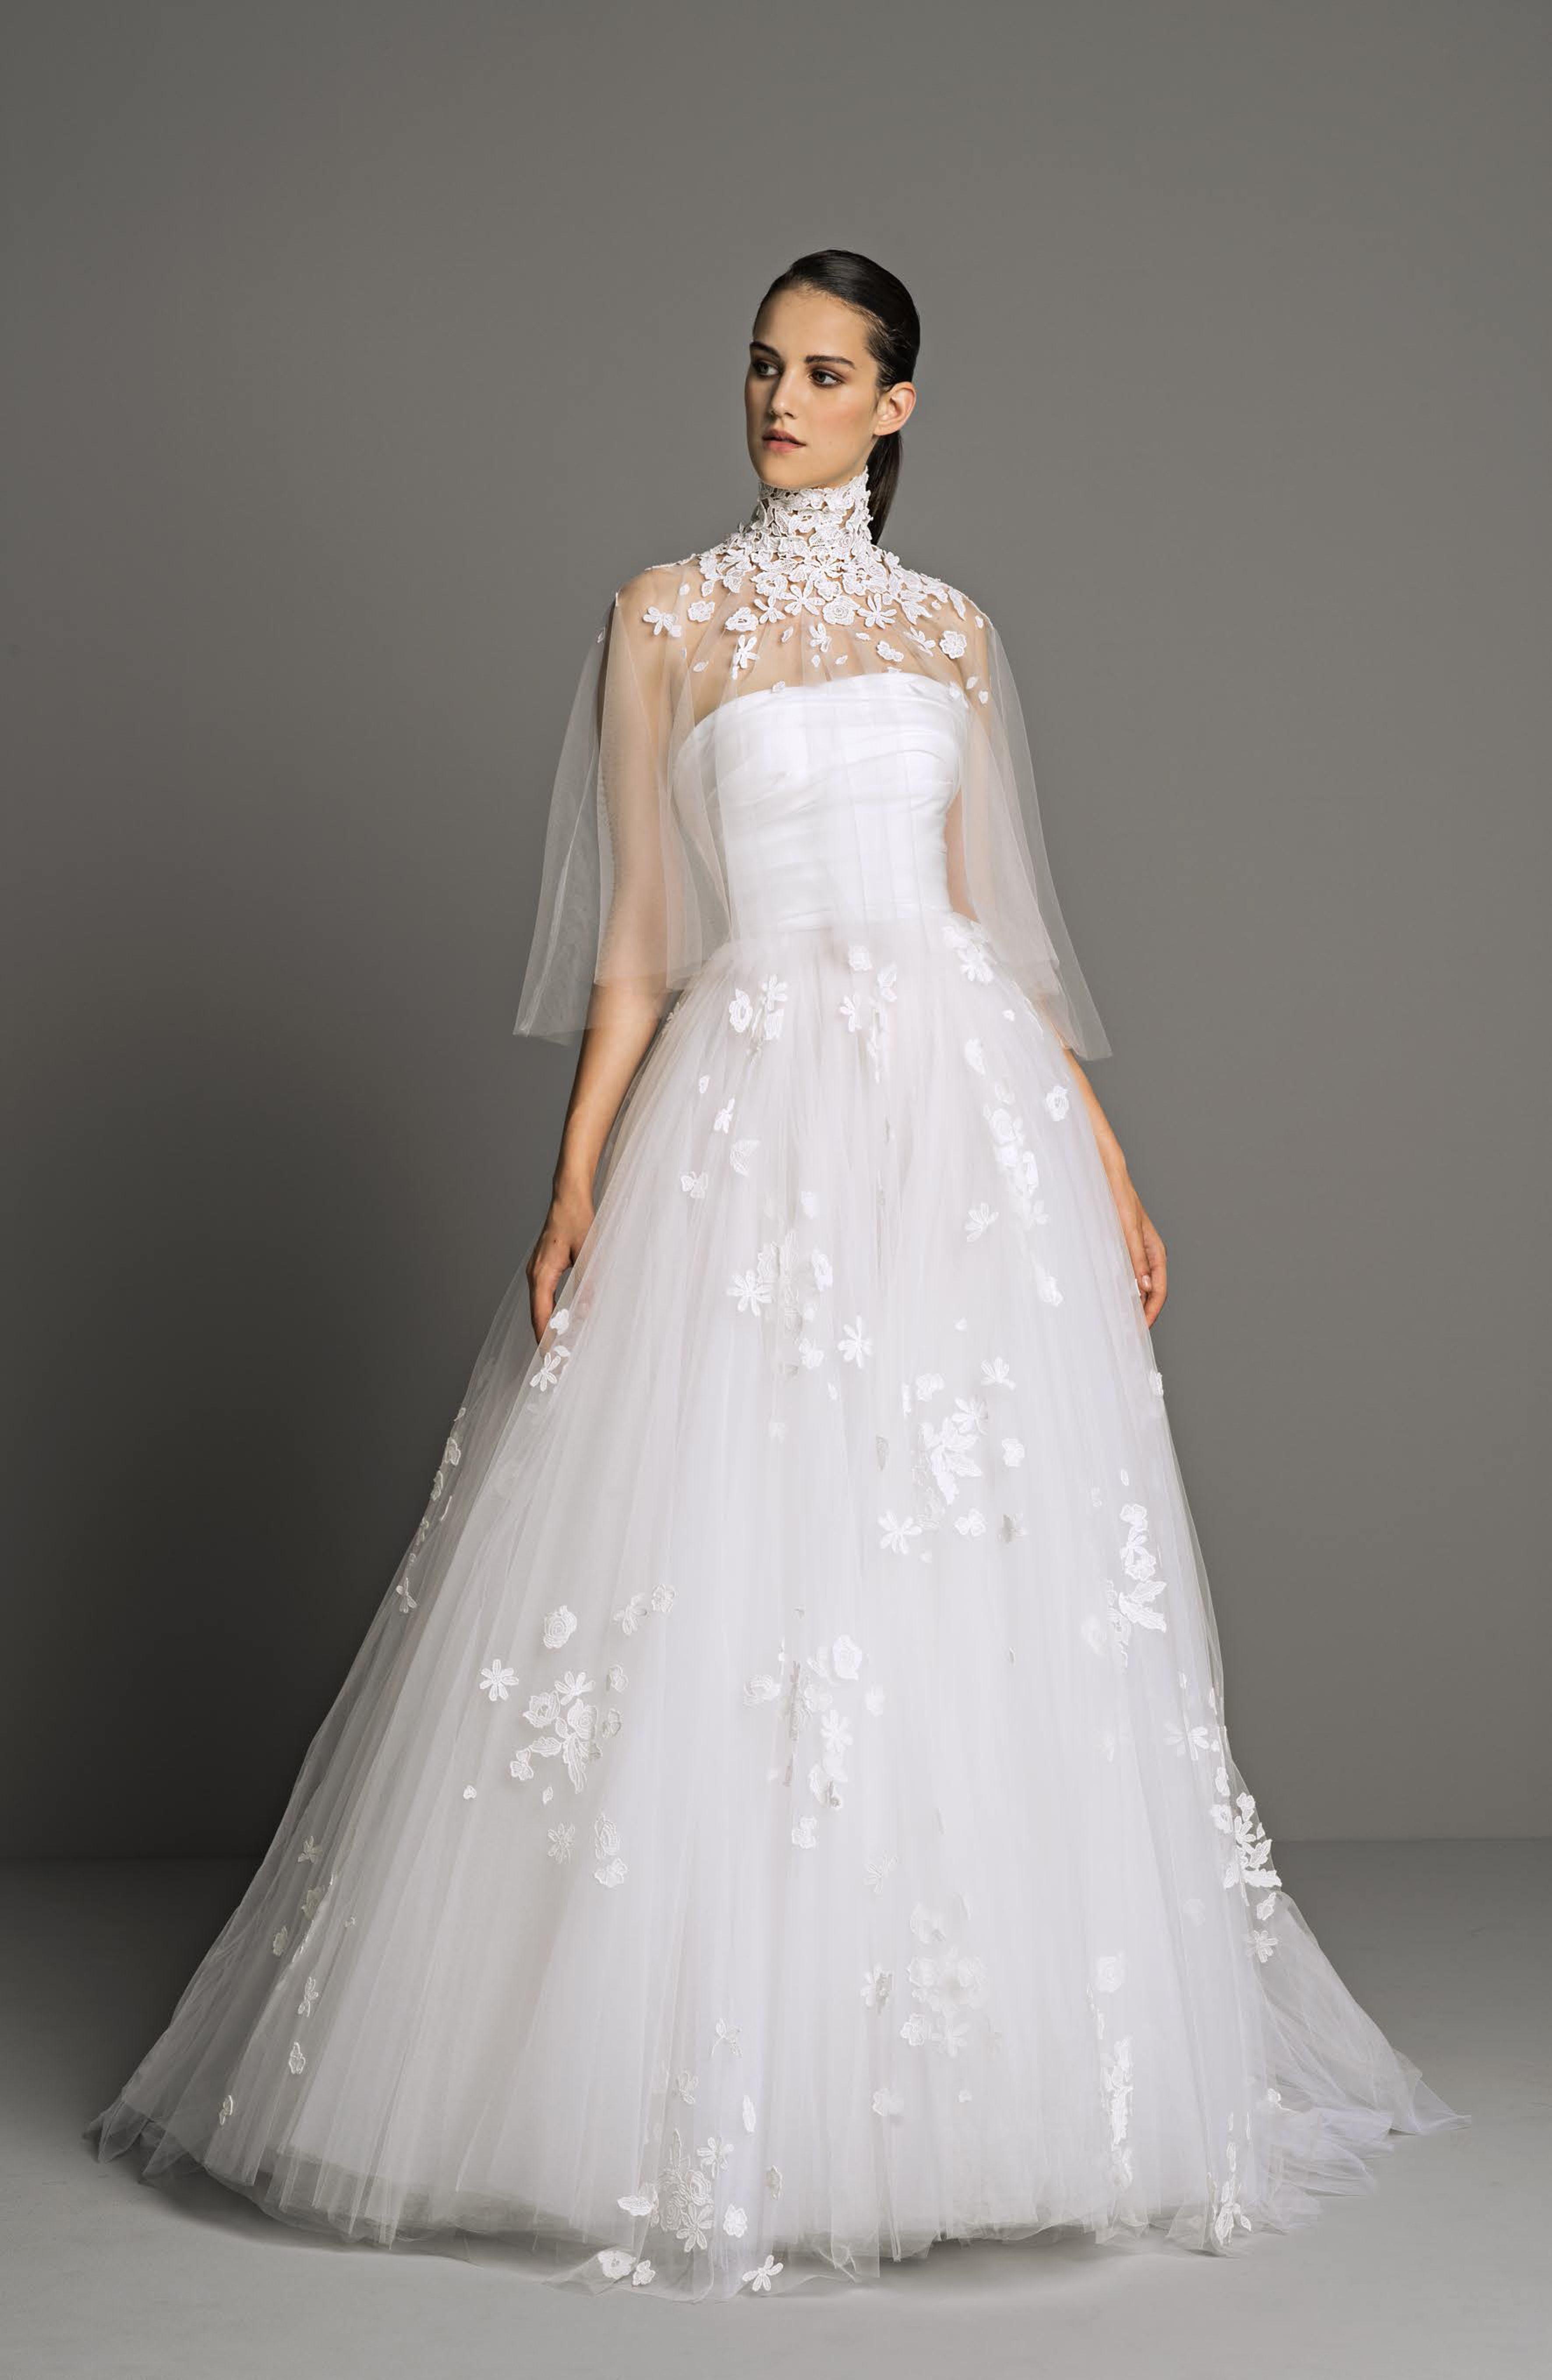 Abiti Da Sposa Italiani.Daisy Peter Langner Weddingdress Abiti Da Sposa Sposa